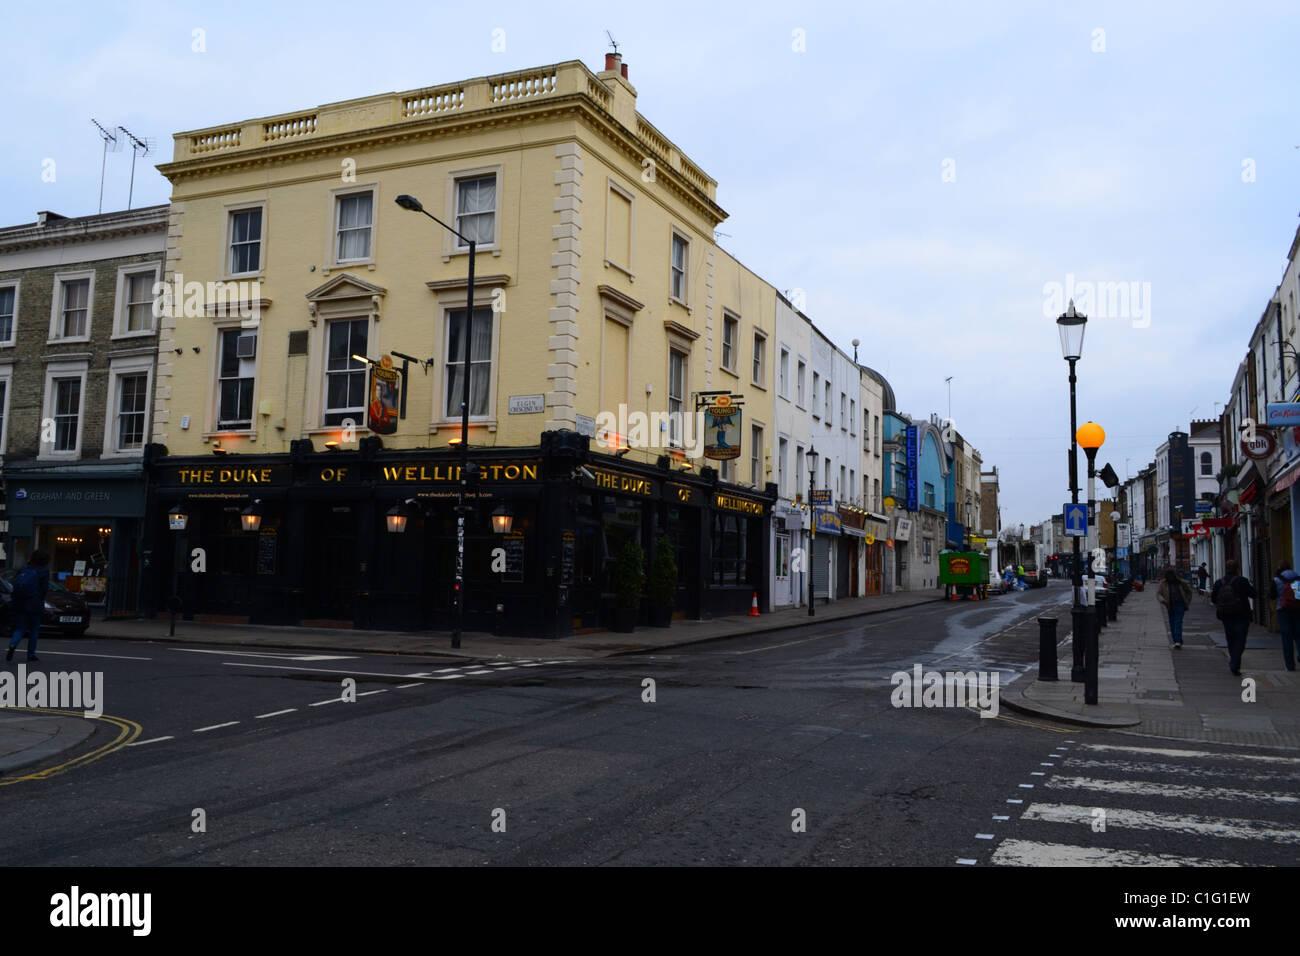 'Duke of Wellington' pub, Portobello Road, Notting Hill, London, Uk ARTIFEX LUCIS - Stock Image